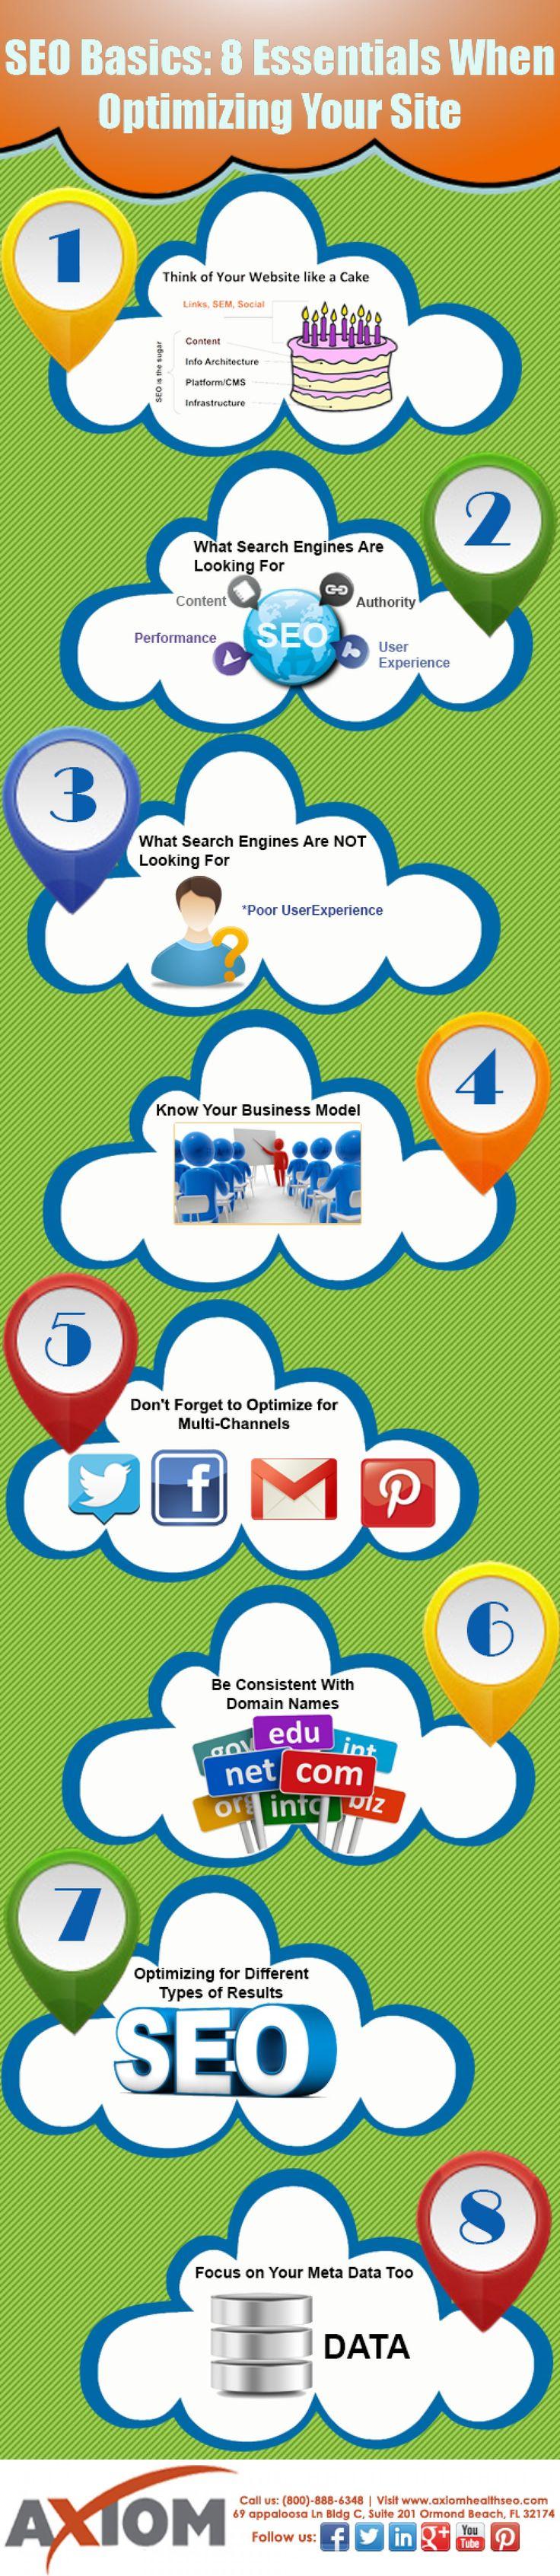 #SEO Basics: 8 Essentials When Optimizing Your Site - Via Pmesocial